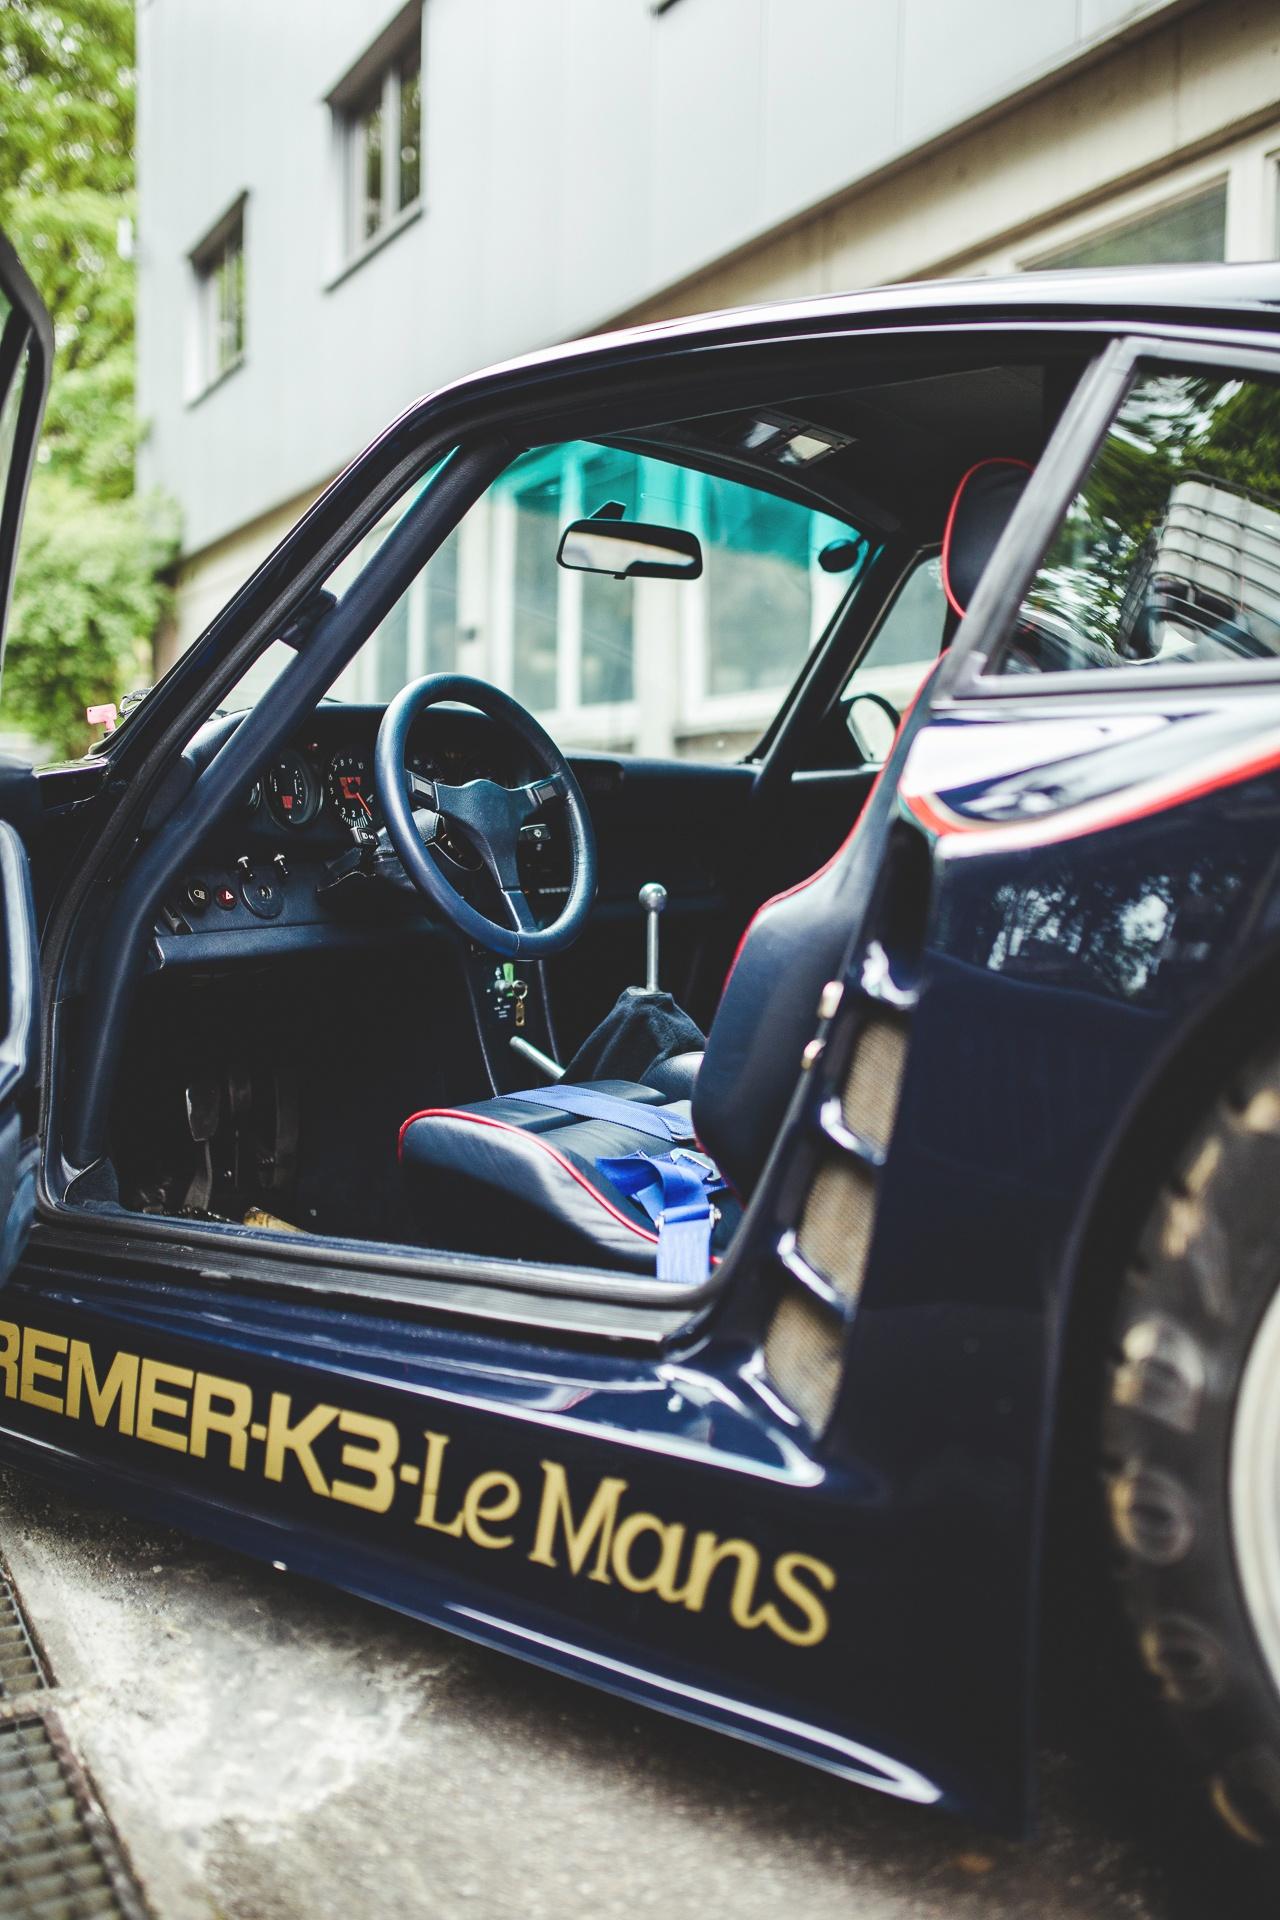 road-going Porsche 935 Kremer K3 - 5